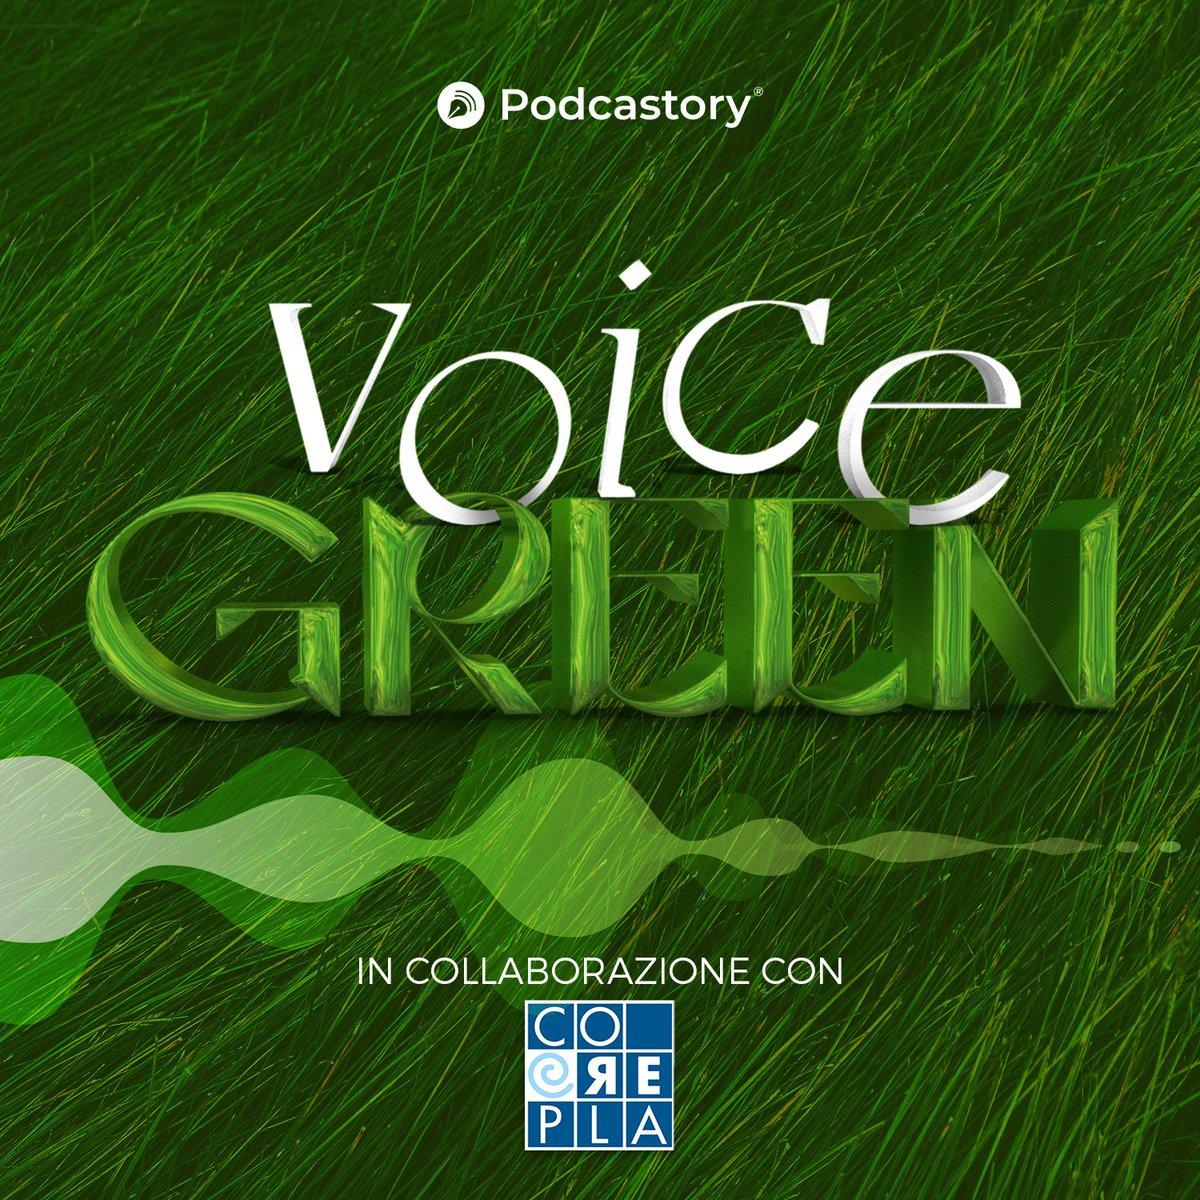 voicegreen-corepla.jpg